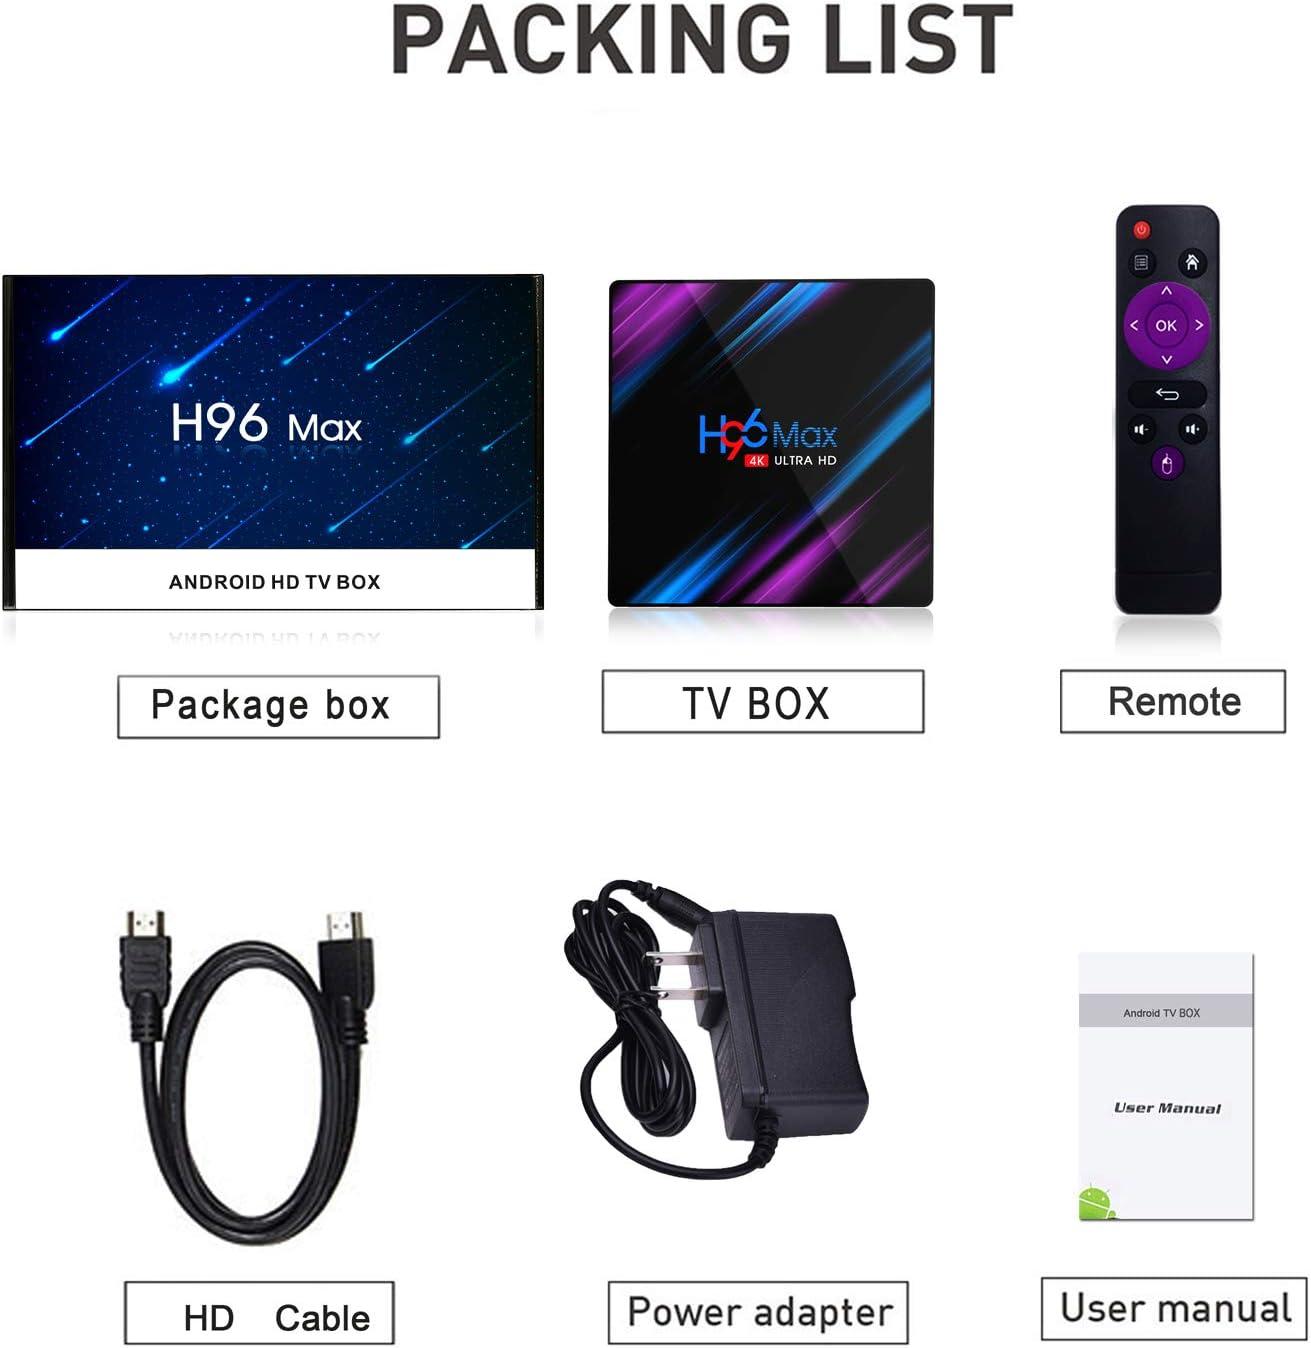 Xilibod H96 MAX TV Box Android 9.0 4GB RAM/64GB ROM, Penta-Core Mali-450 Up to 750Mhz+, RK3318 Quad-Core 64bit Cortex-A53, H.265 Decoding 2.4GHz/5GHz WiFi Smart TV Box: Amazon.es: Electrónica